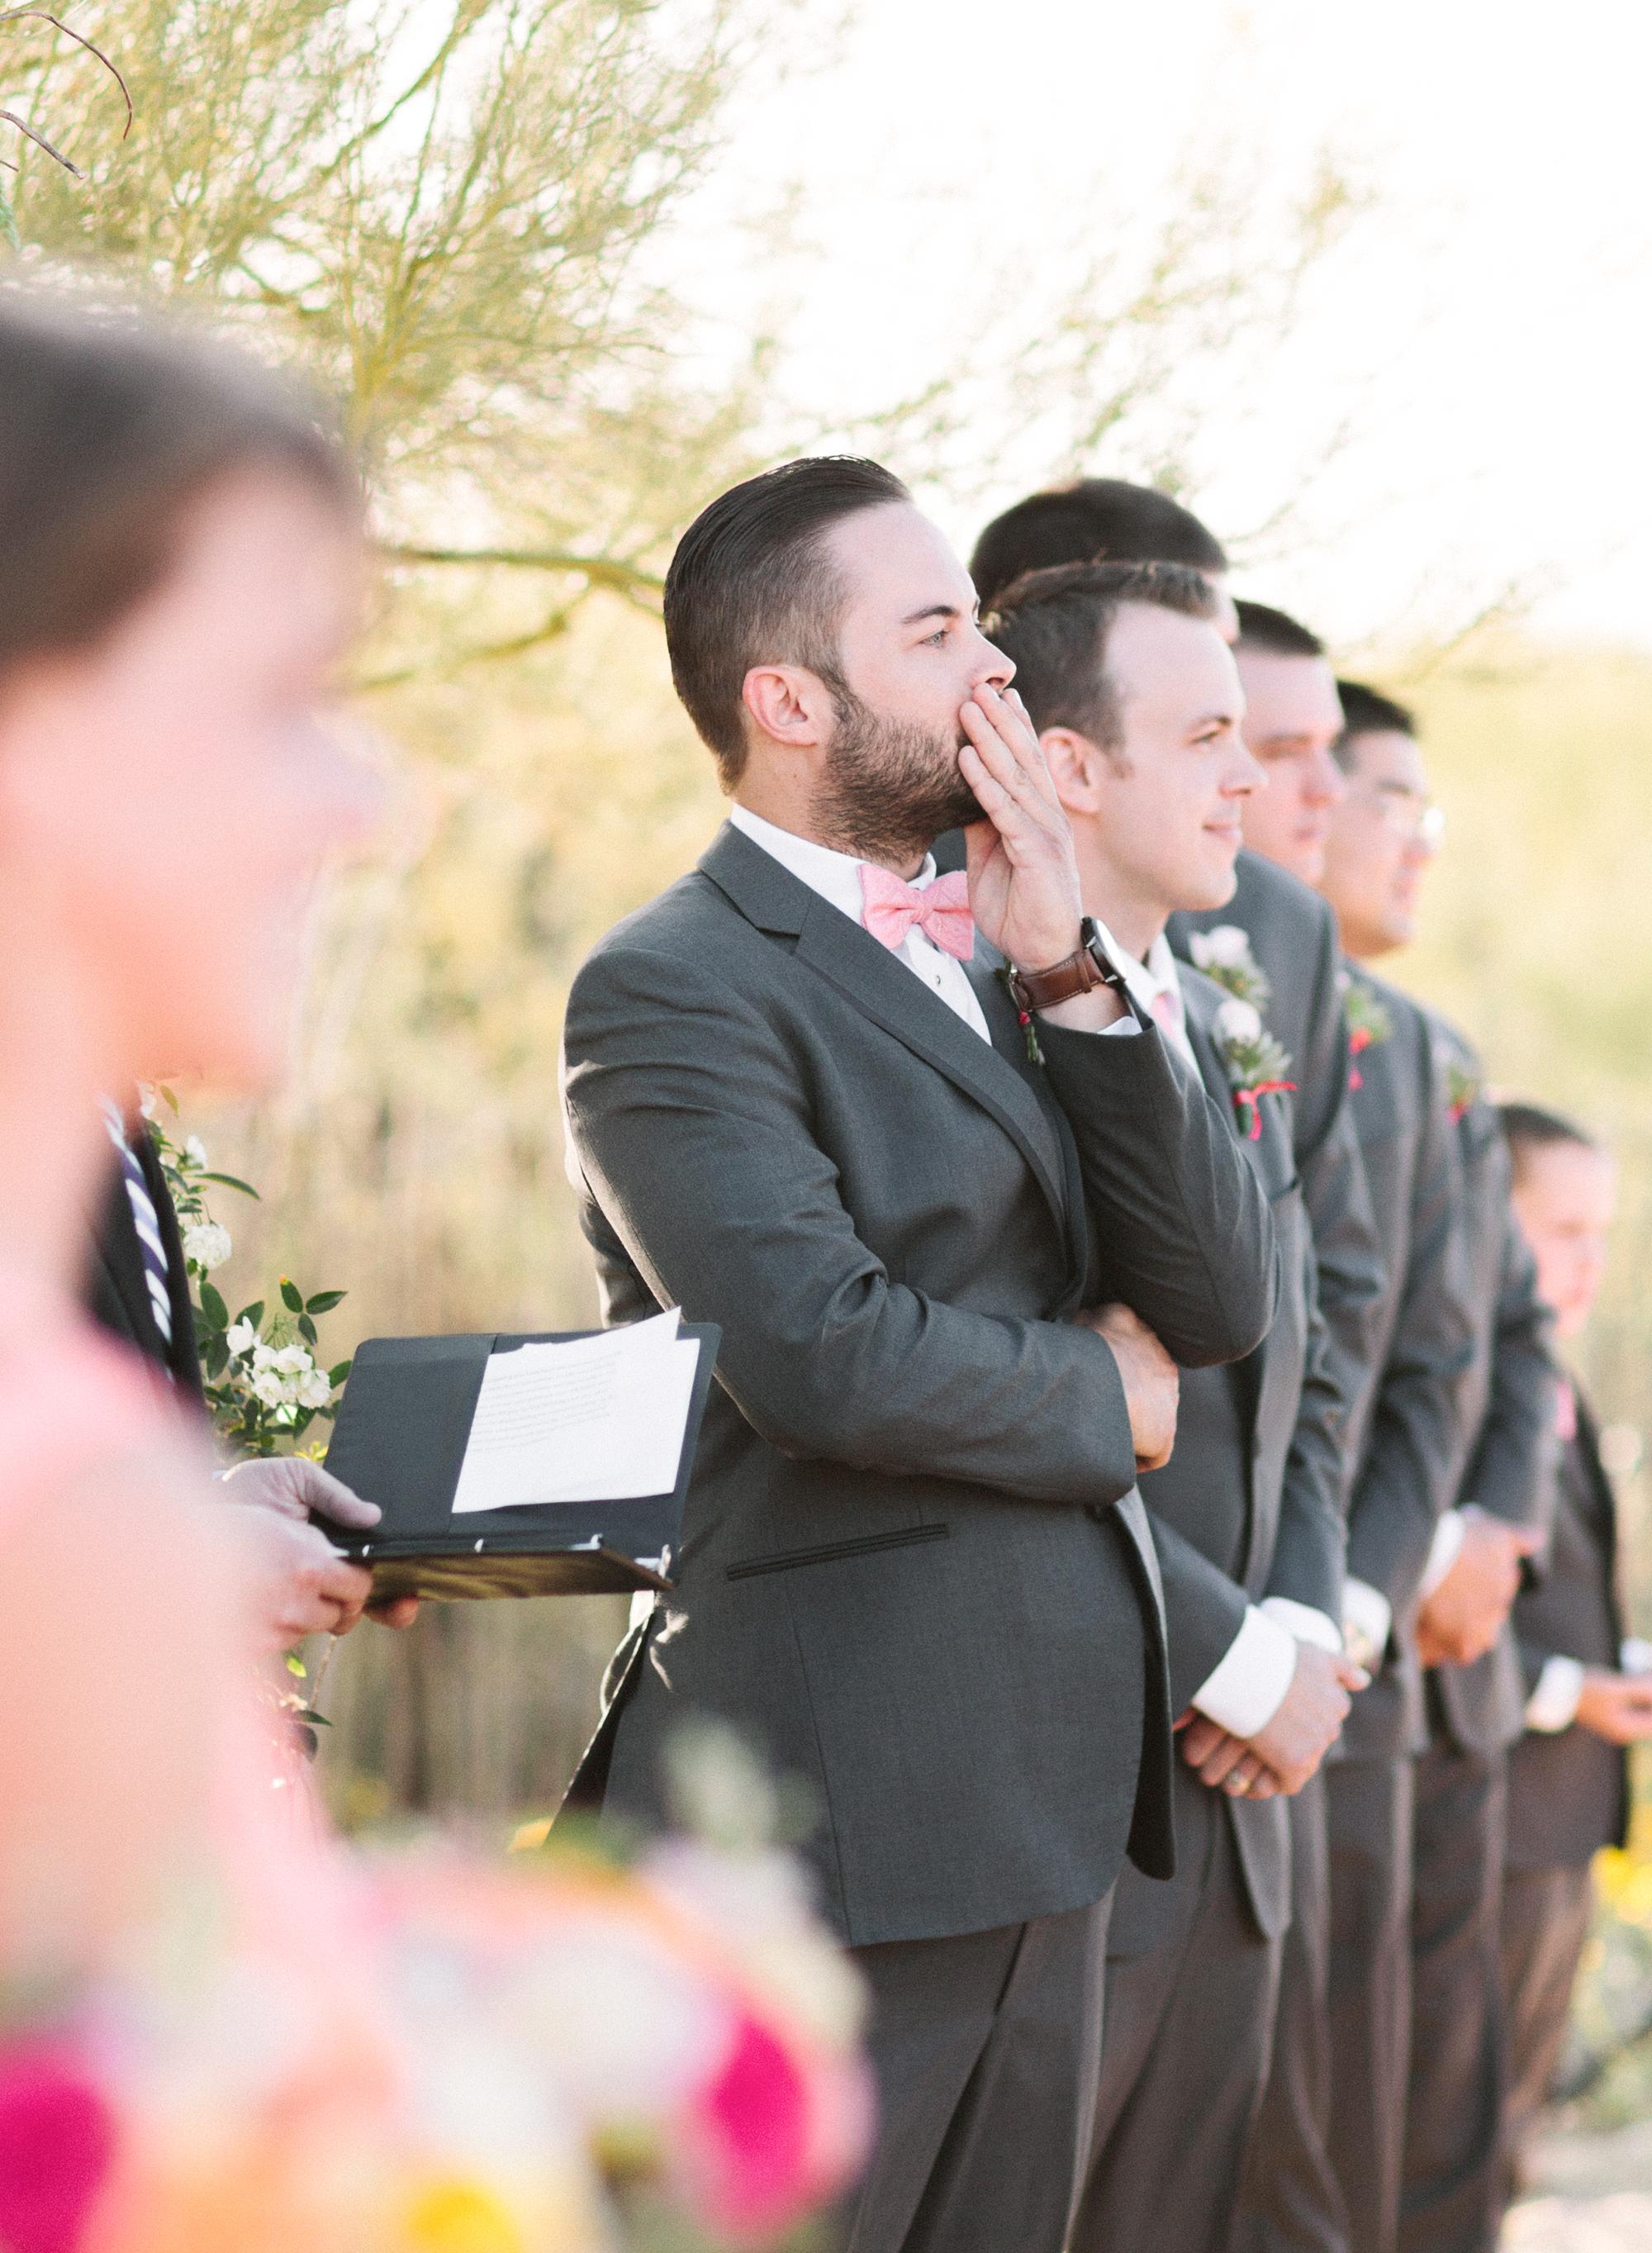 Groom's first look as his bride walks down the aisle